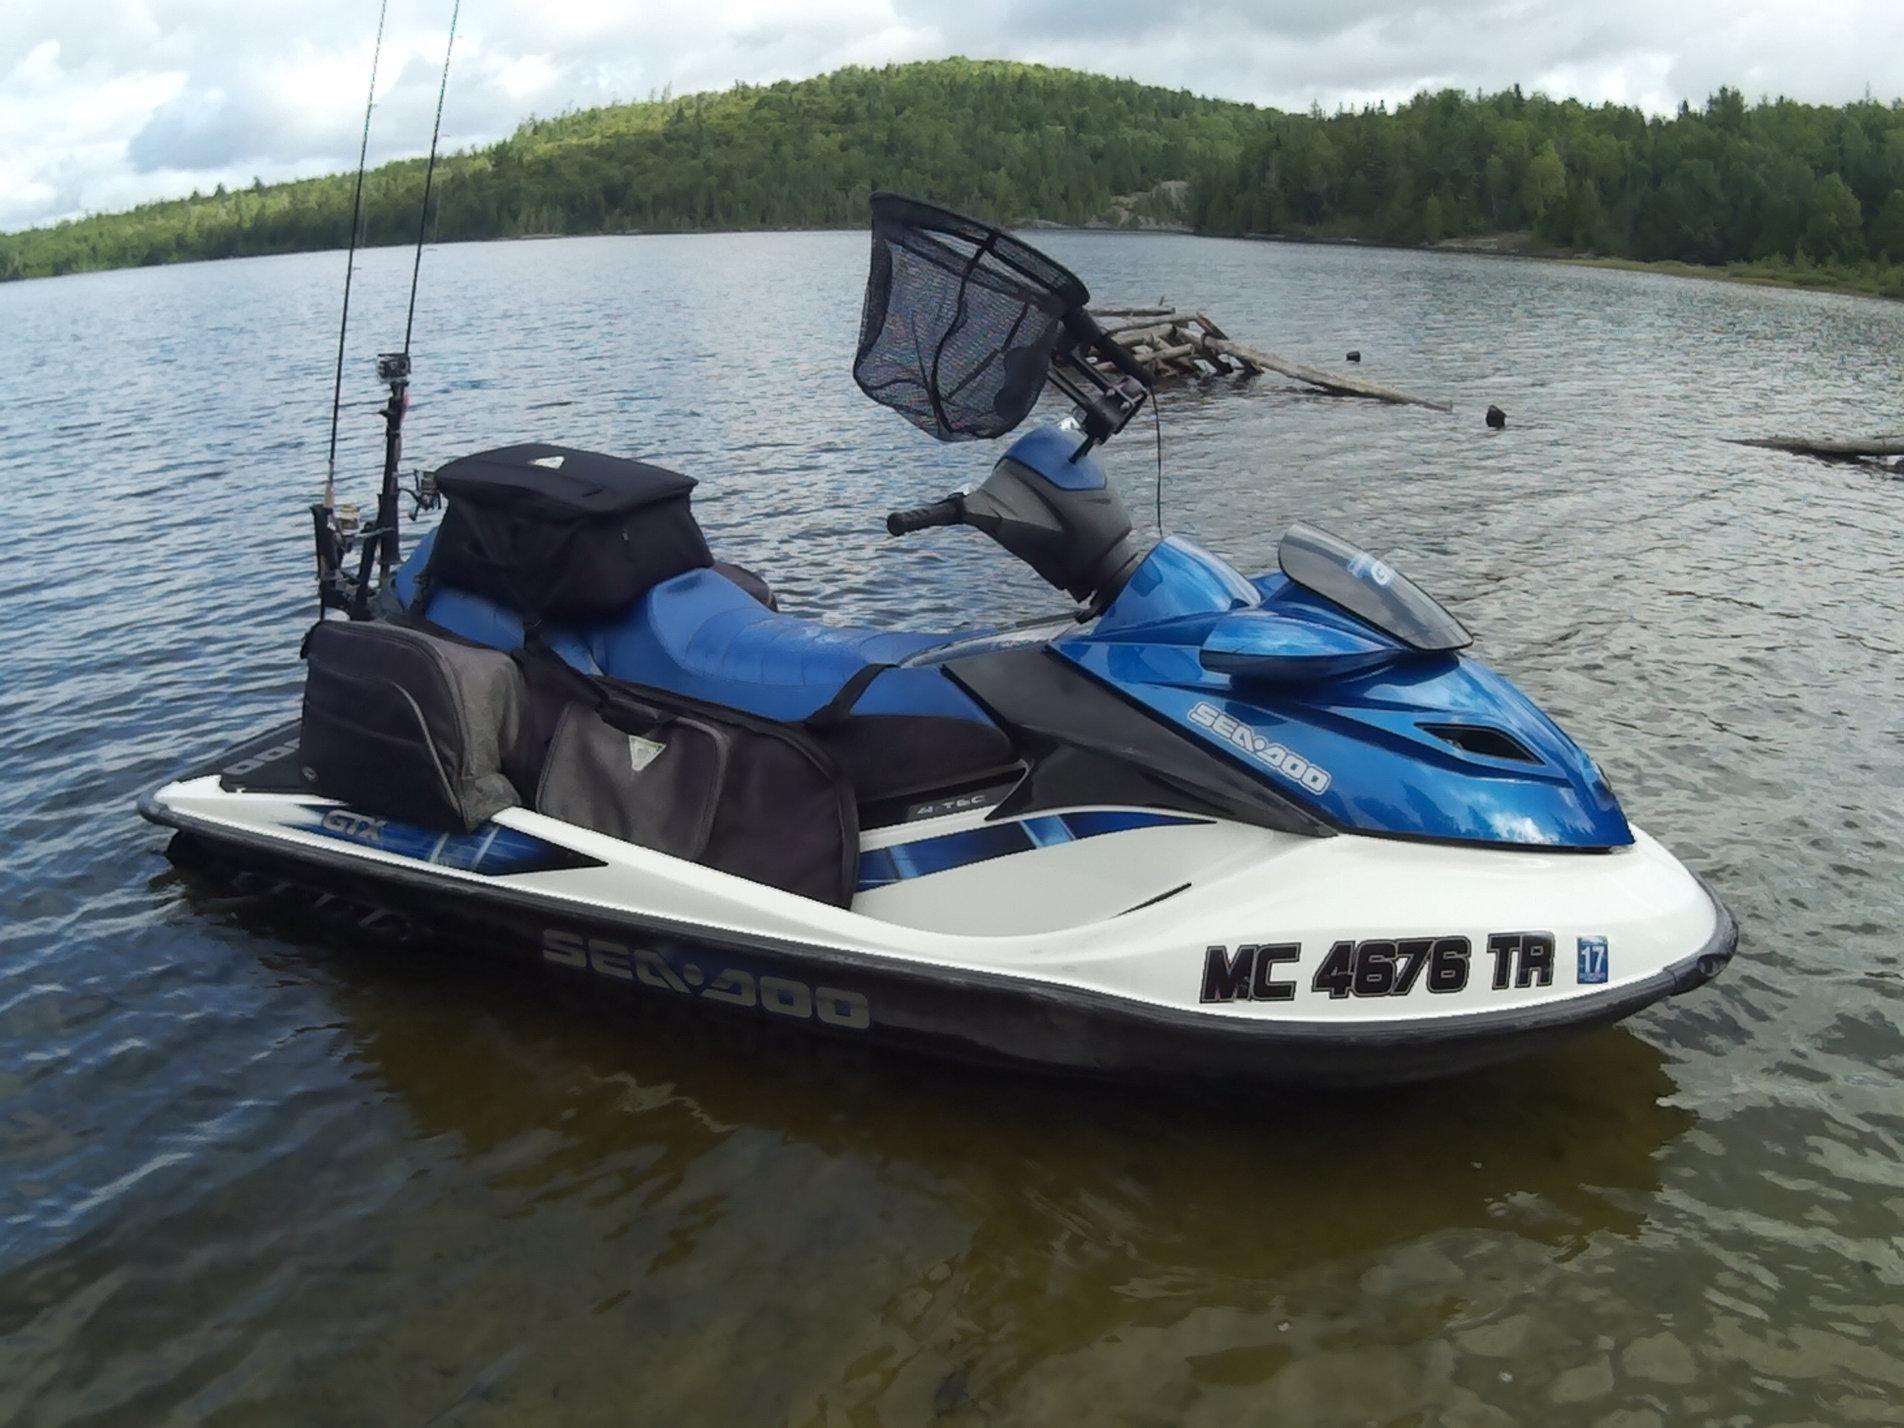 Jet ski fishing equipment maverick fish hunter michigan for Jet ski fishing accessories